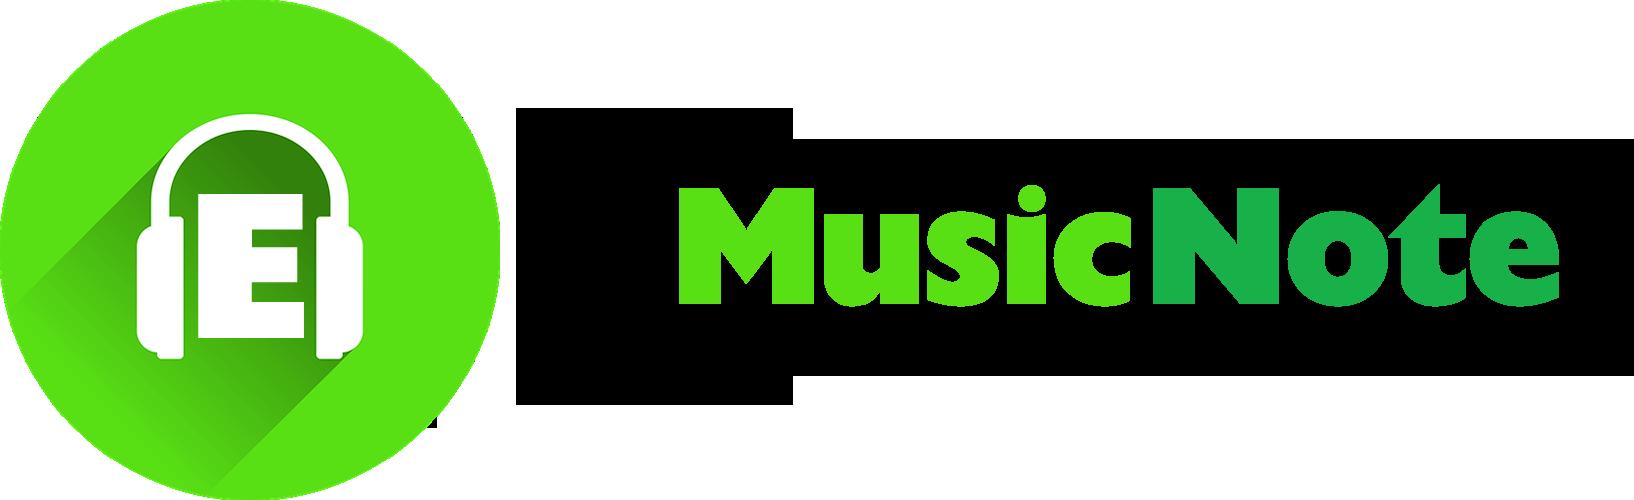 eMusicNote